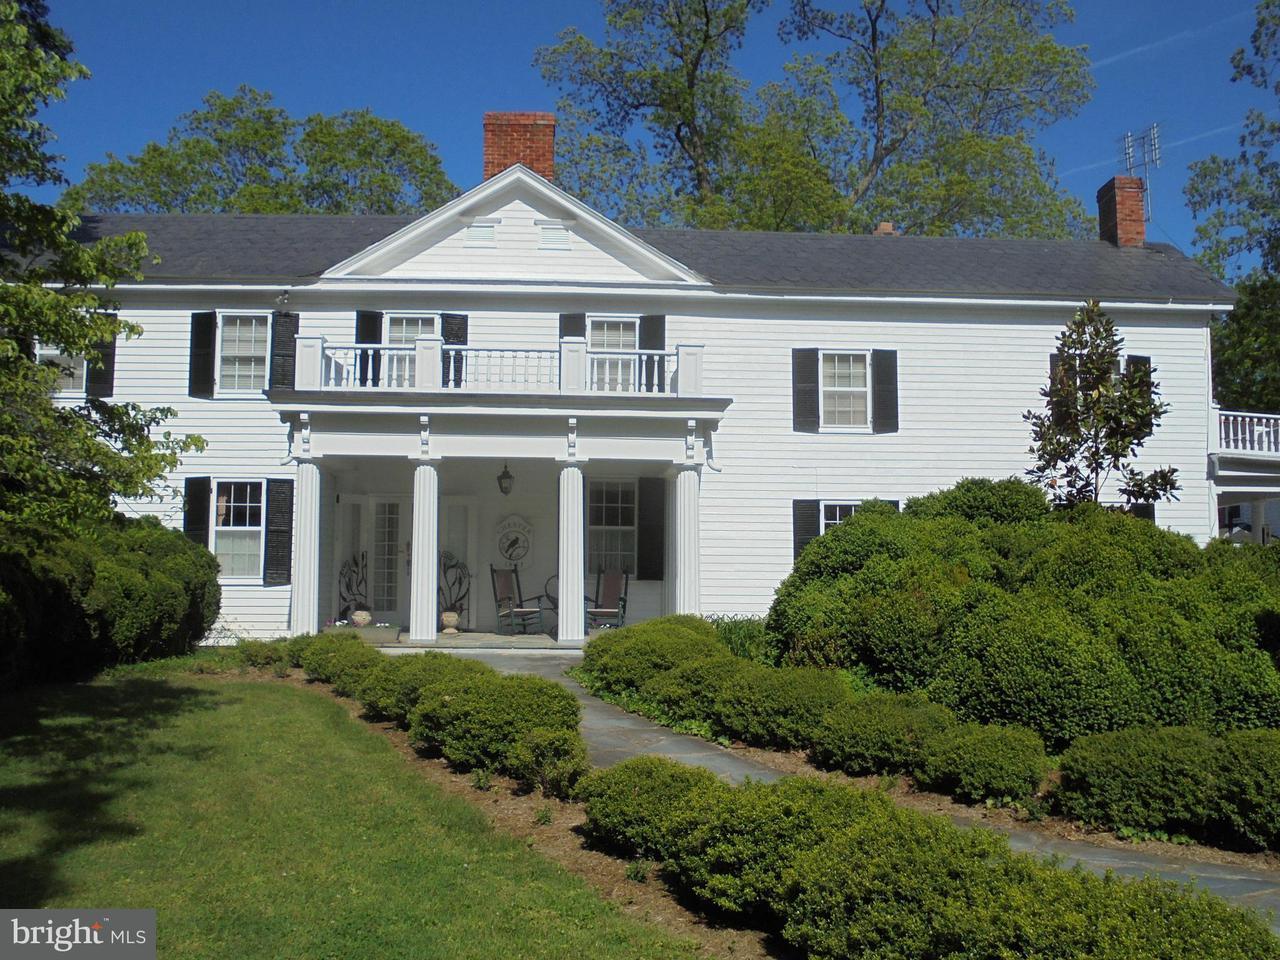 獨棟家庭住宅 為 出售 在 243 James River Road 243 James River Road Scottsville, 弗吉尼亞州 24590 美國